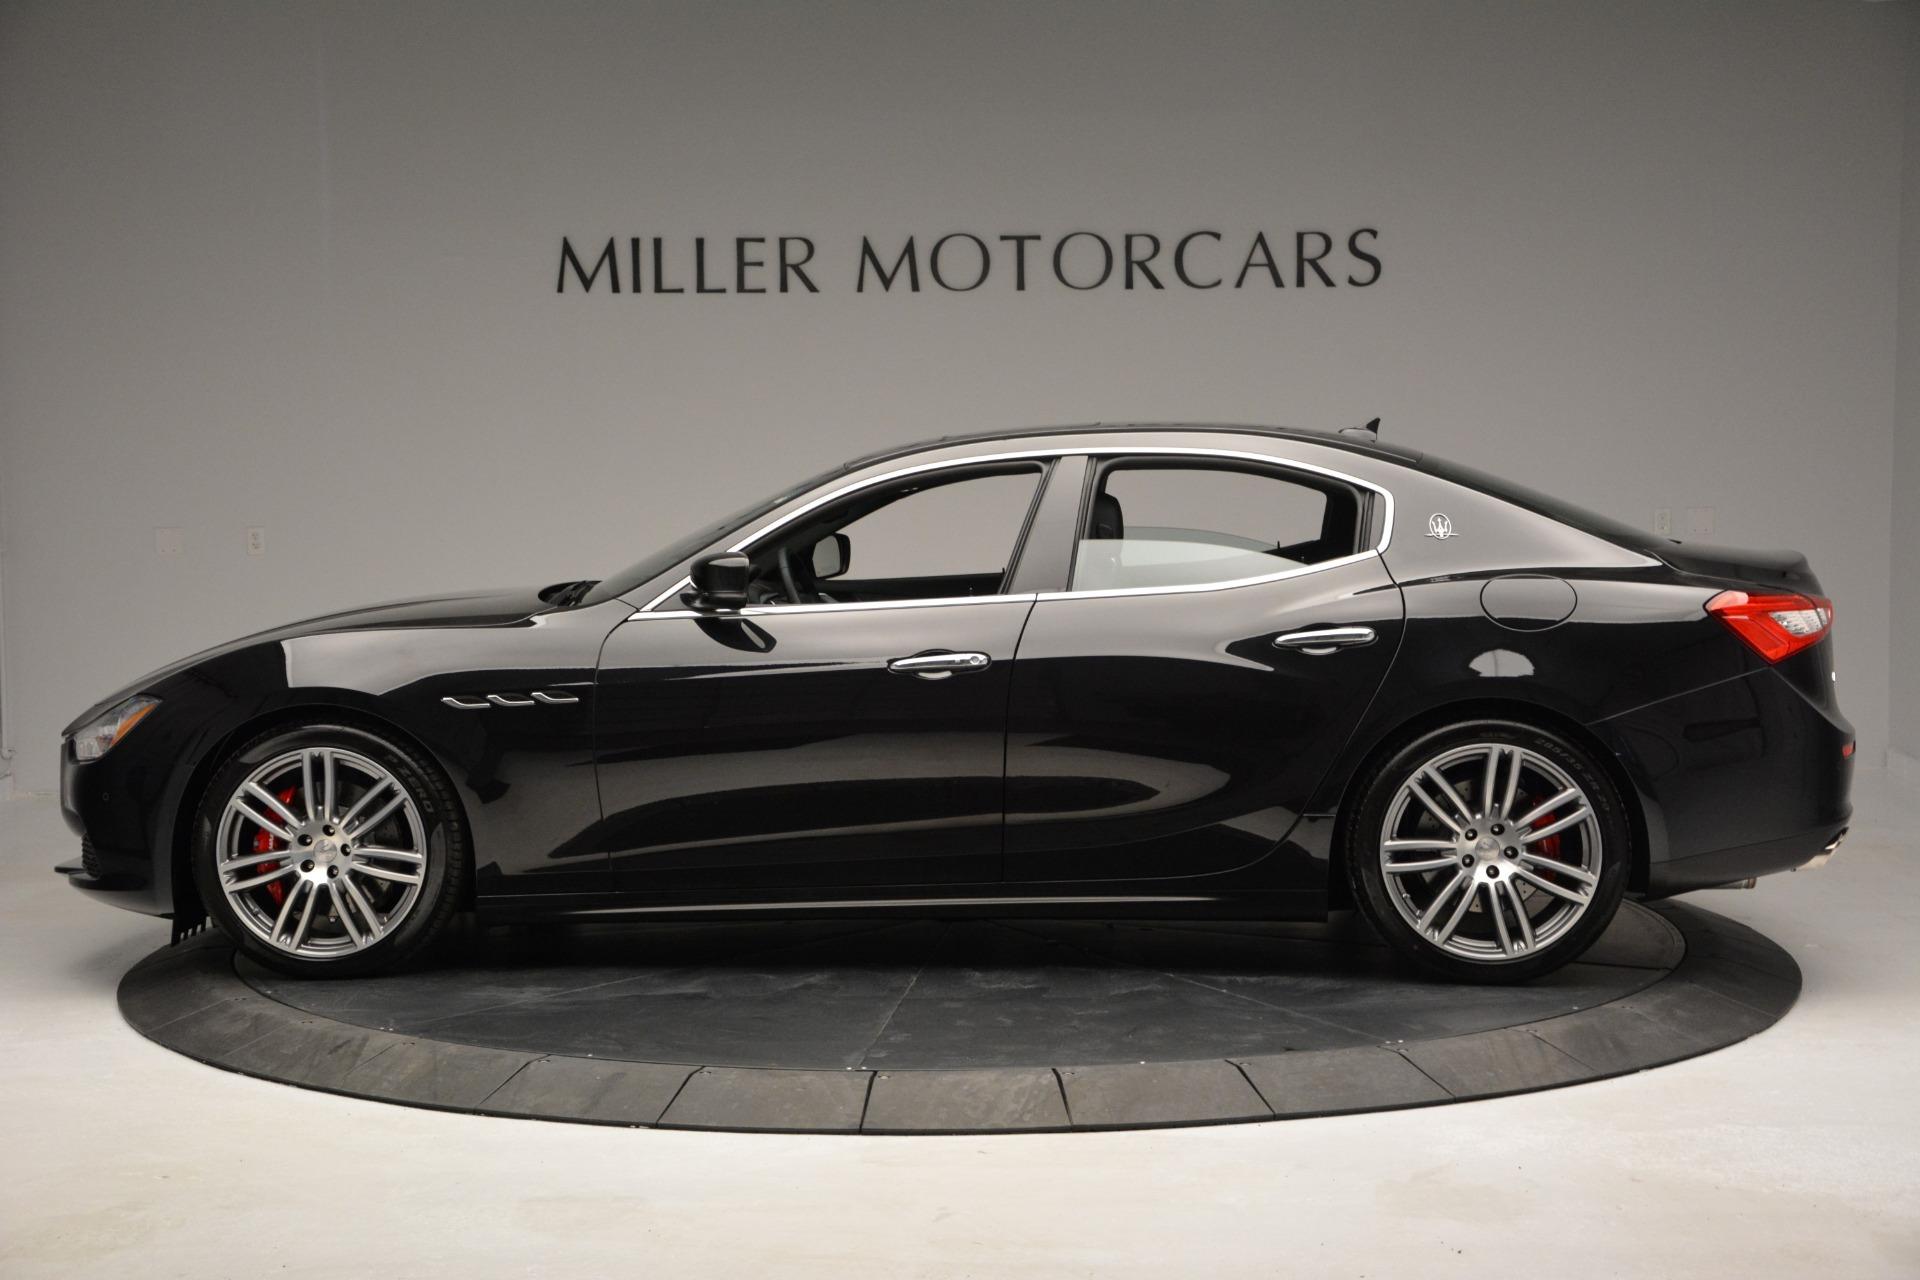 Used 2015 Maserati Ghibli S Q4 For Sale In Greenwich, CT. Alfa Romeo of Greenwich, 7325 2070_p3